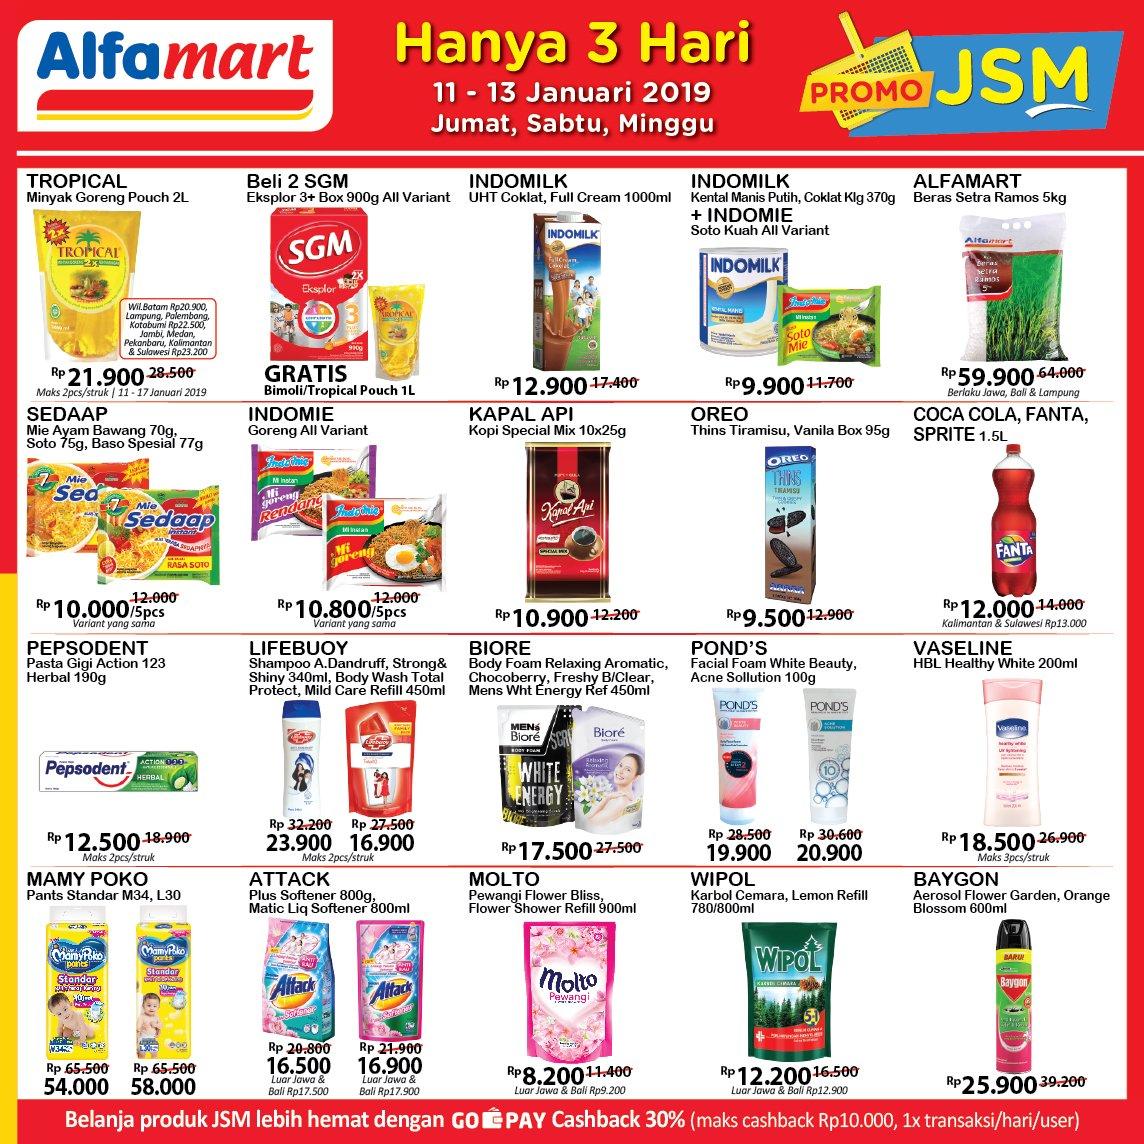 Katalog Promo JSM Alfamart 11-13 Januari 2019